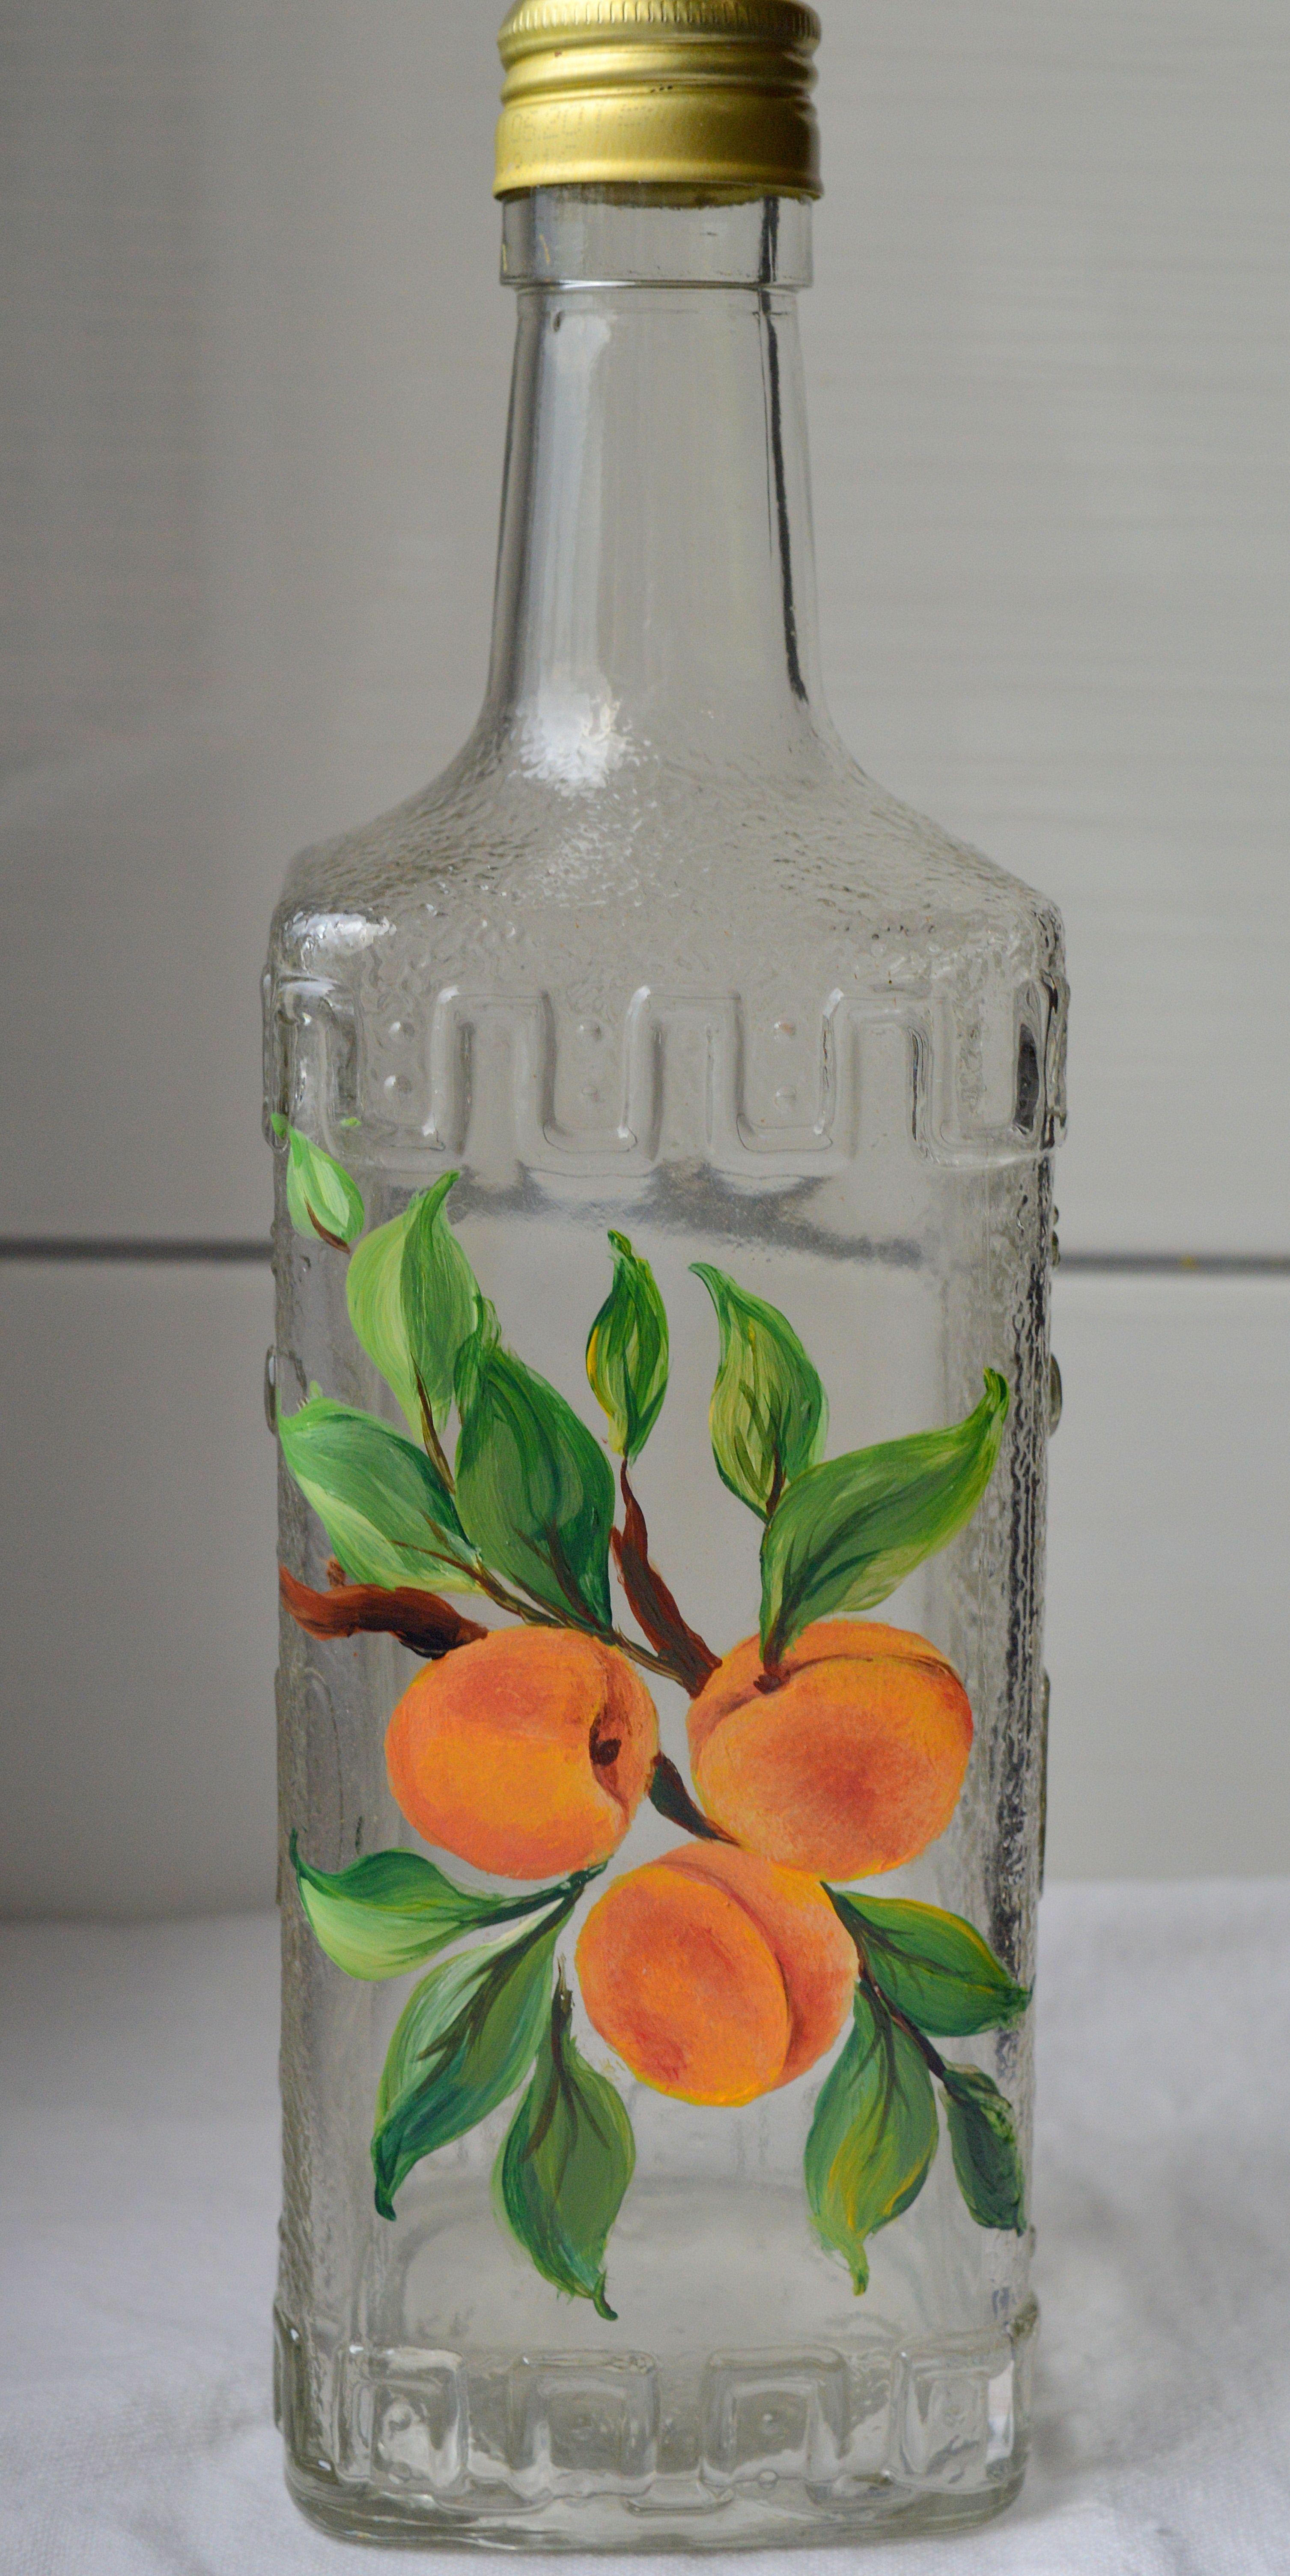 Acrylic Bottle Paint Designs The Future